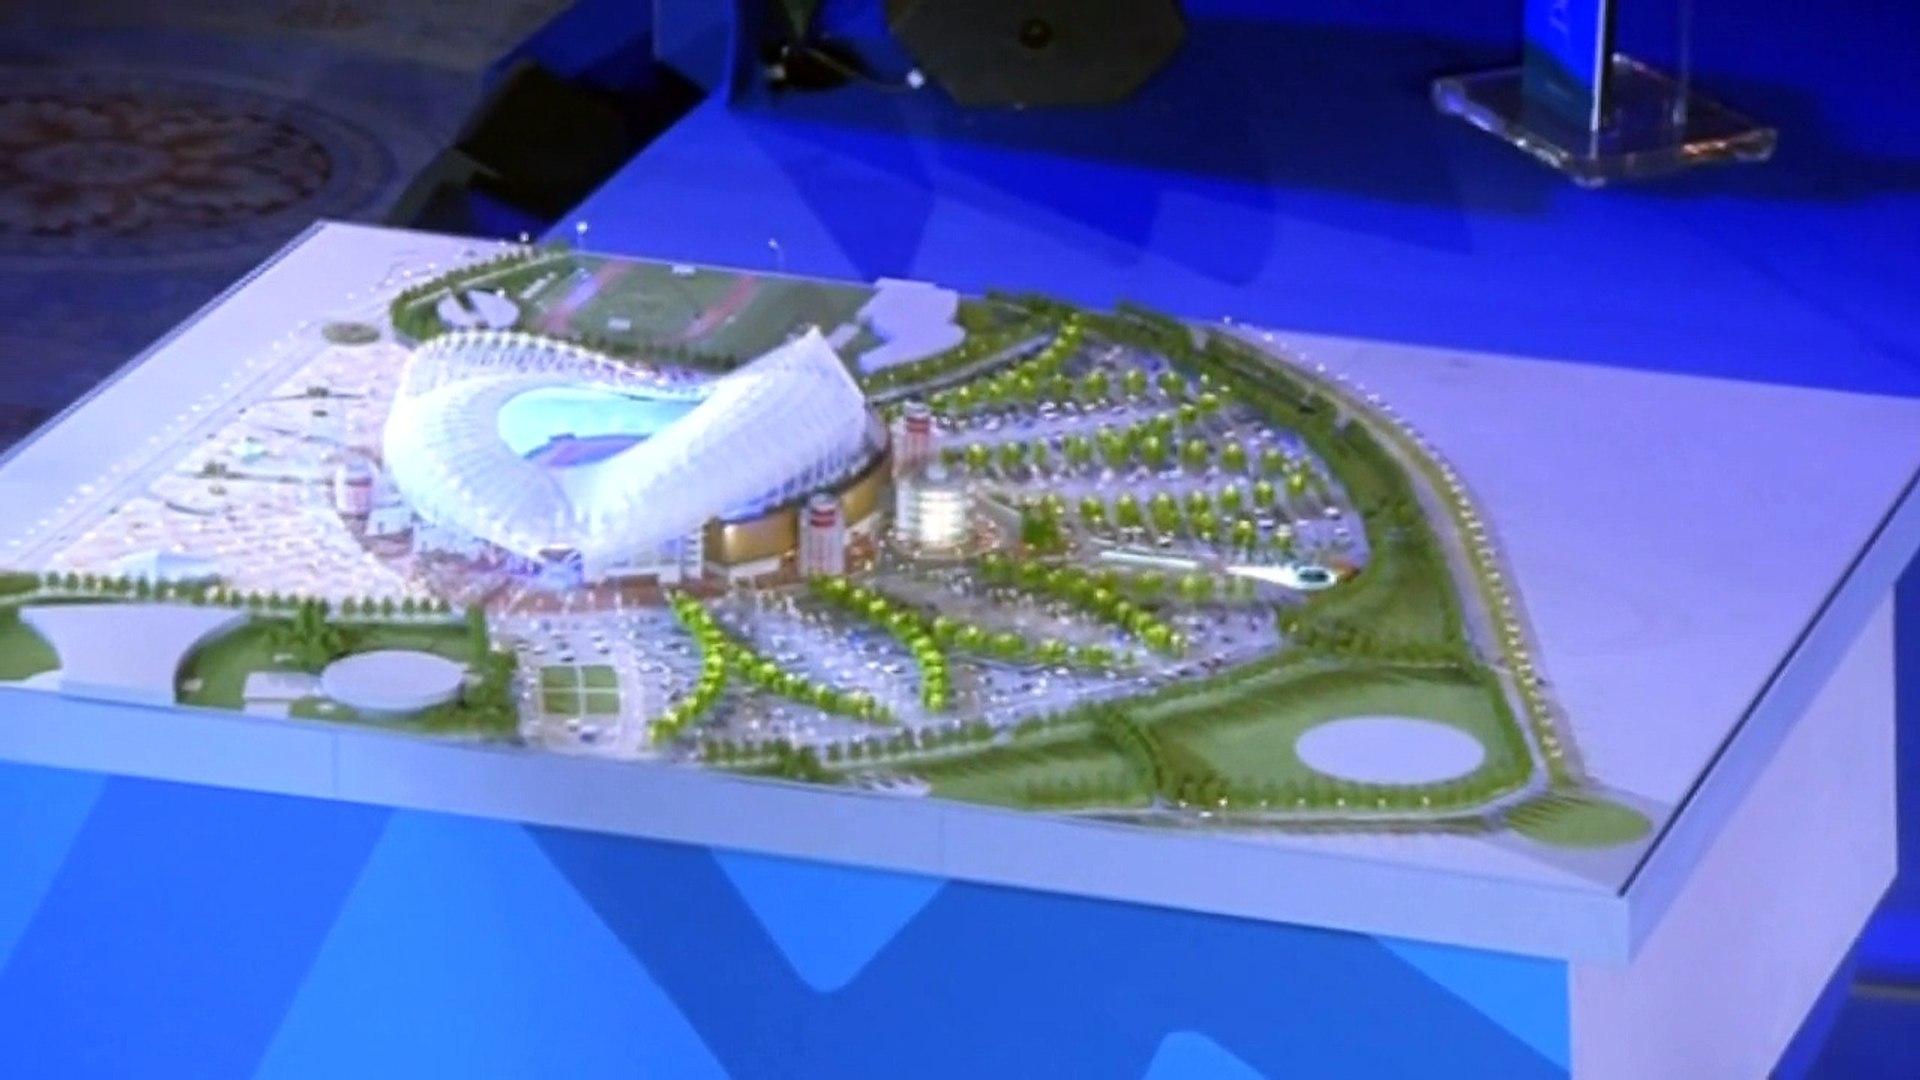 Qatar showcase 2022 World Cup stadium